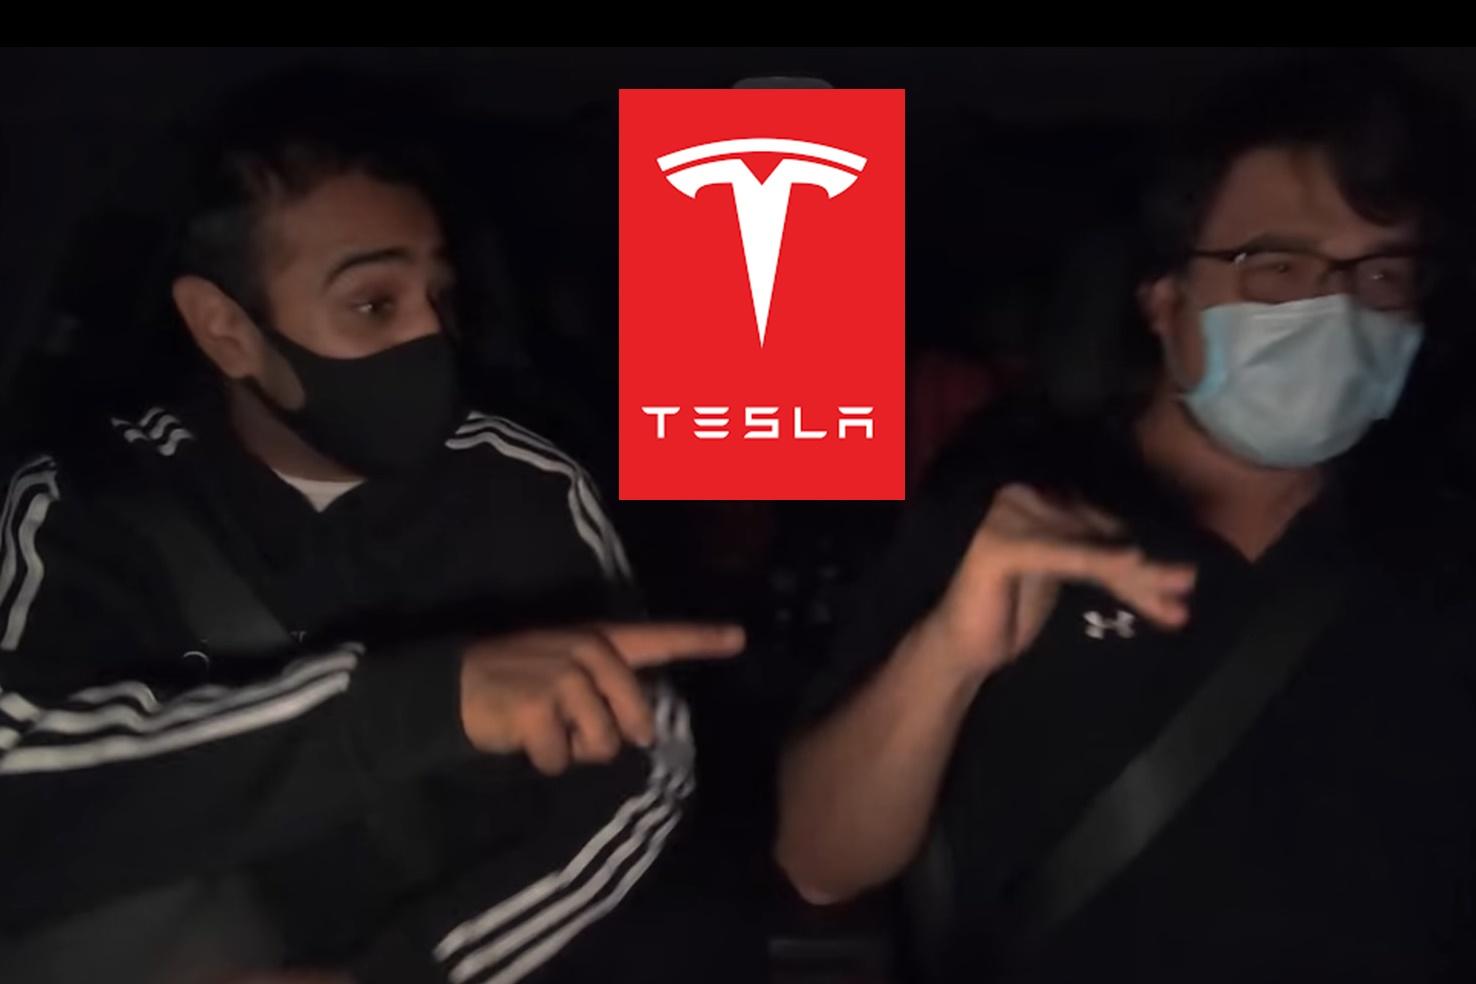 Vídeos mostram o Tesla Autopilot 100% autônomo funcionando; veja